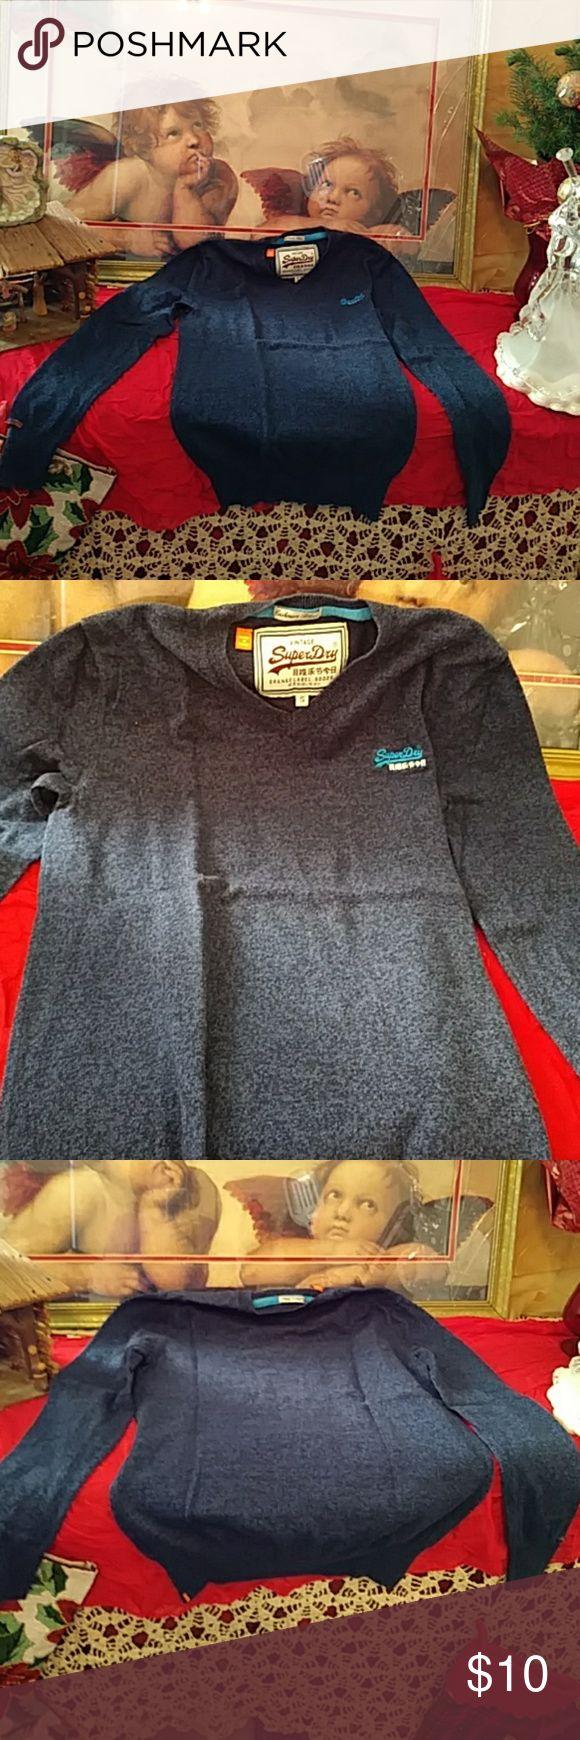 I just added this listing on Poshmark: Boys vintage Superdry sweater. #shopmycloset #poshmark #fashion #shopping #style #forsale #vintage Superdry #Other